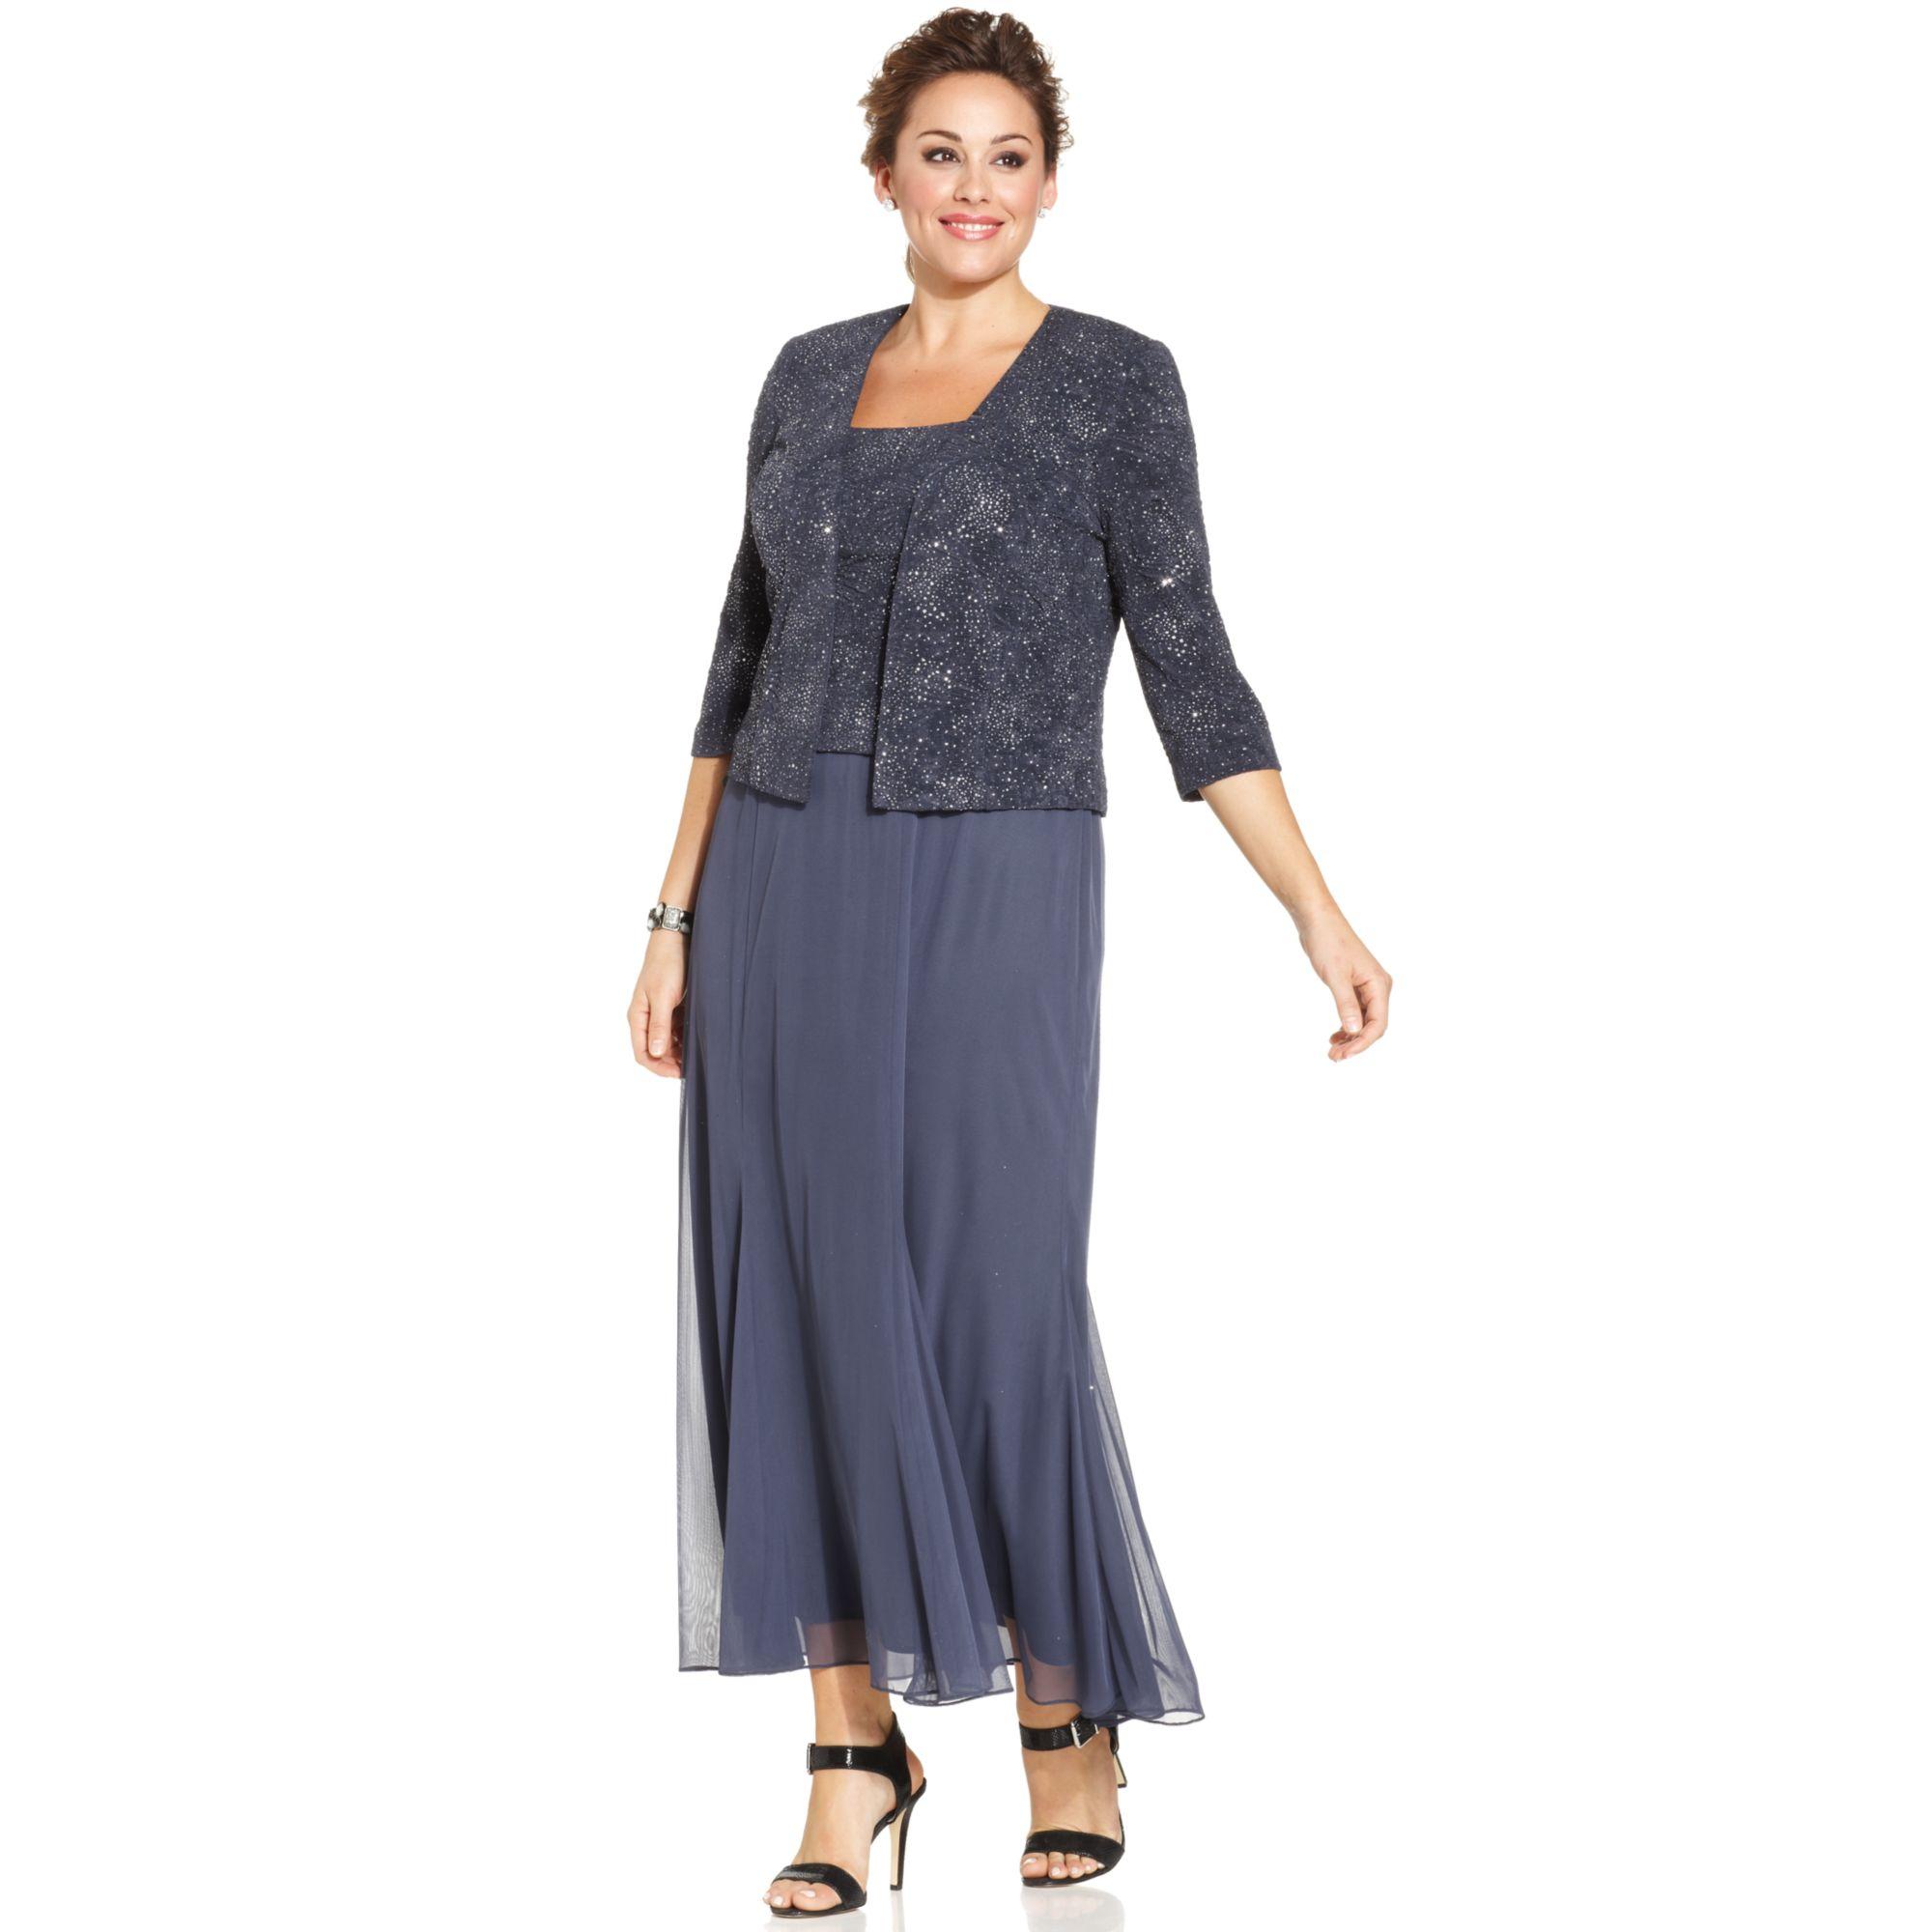 Macy\'s Alex Evenings Dress – Fashion dresses